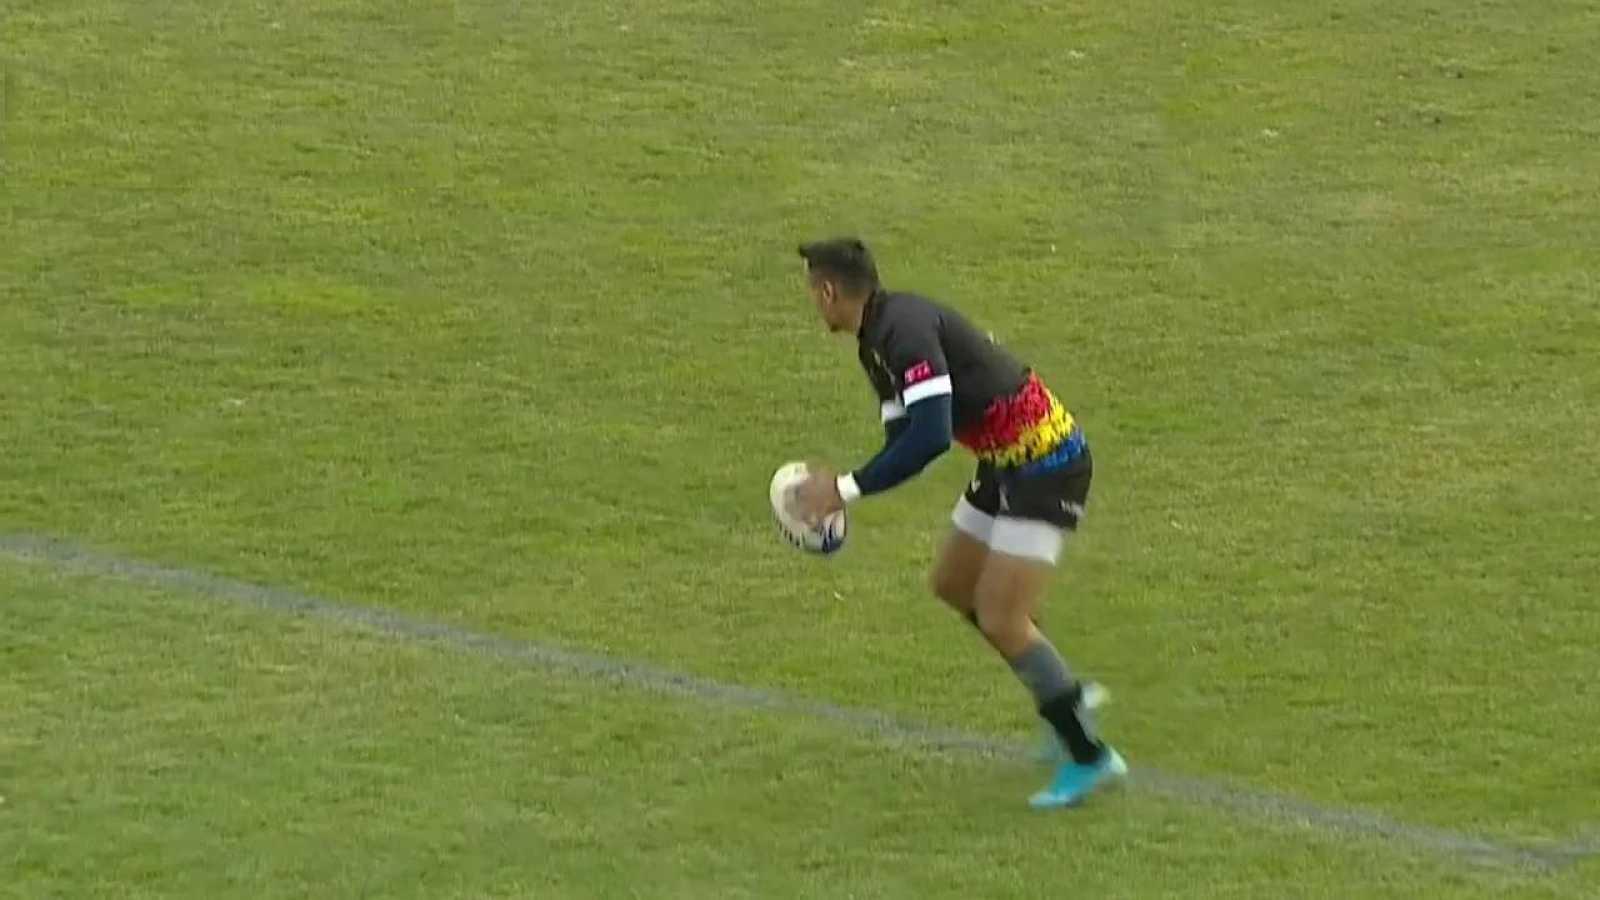 Rugby - Campeonato de Europa Masculino: Rumanía - España - ver ahora